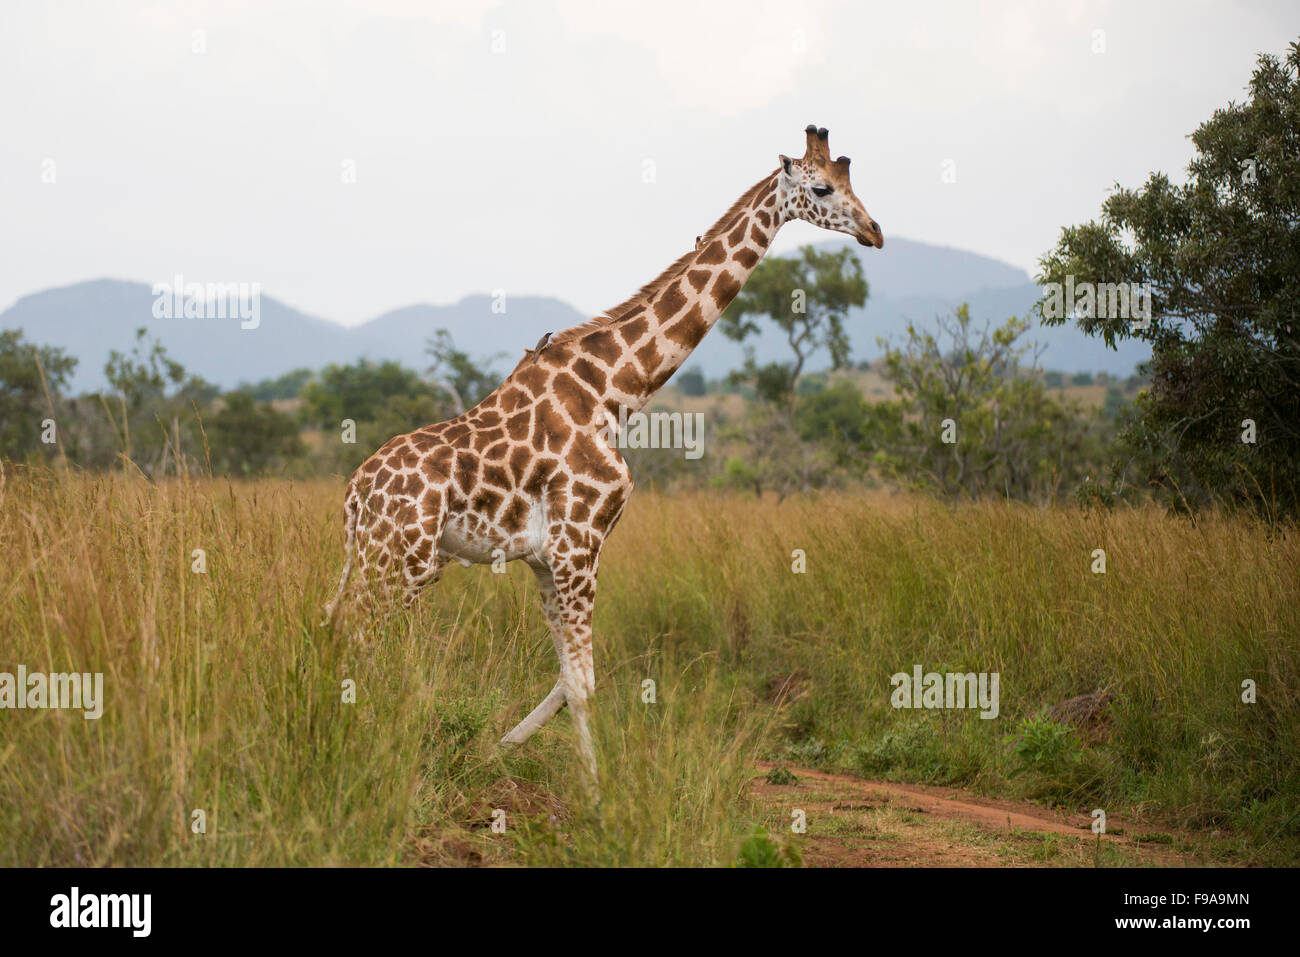 Rothschild Giraffe (Giraffa camelopardalis rothschildi), Kidepo Valley National Park, Uganda - Stock Image